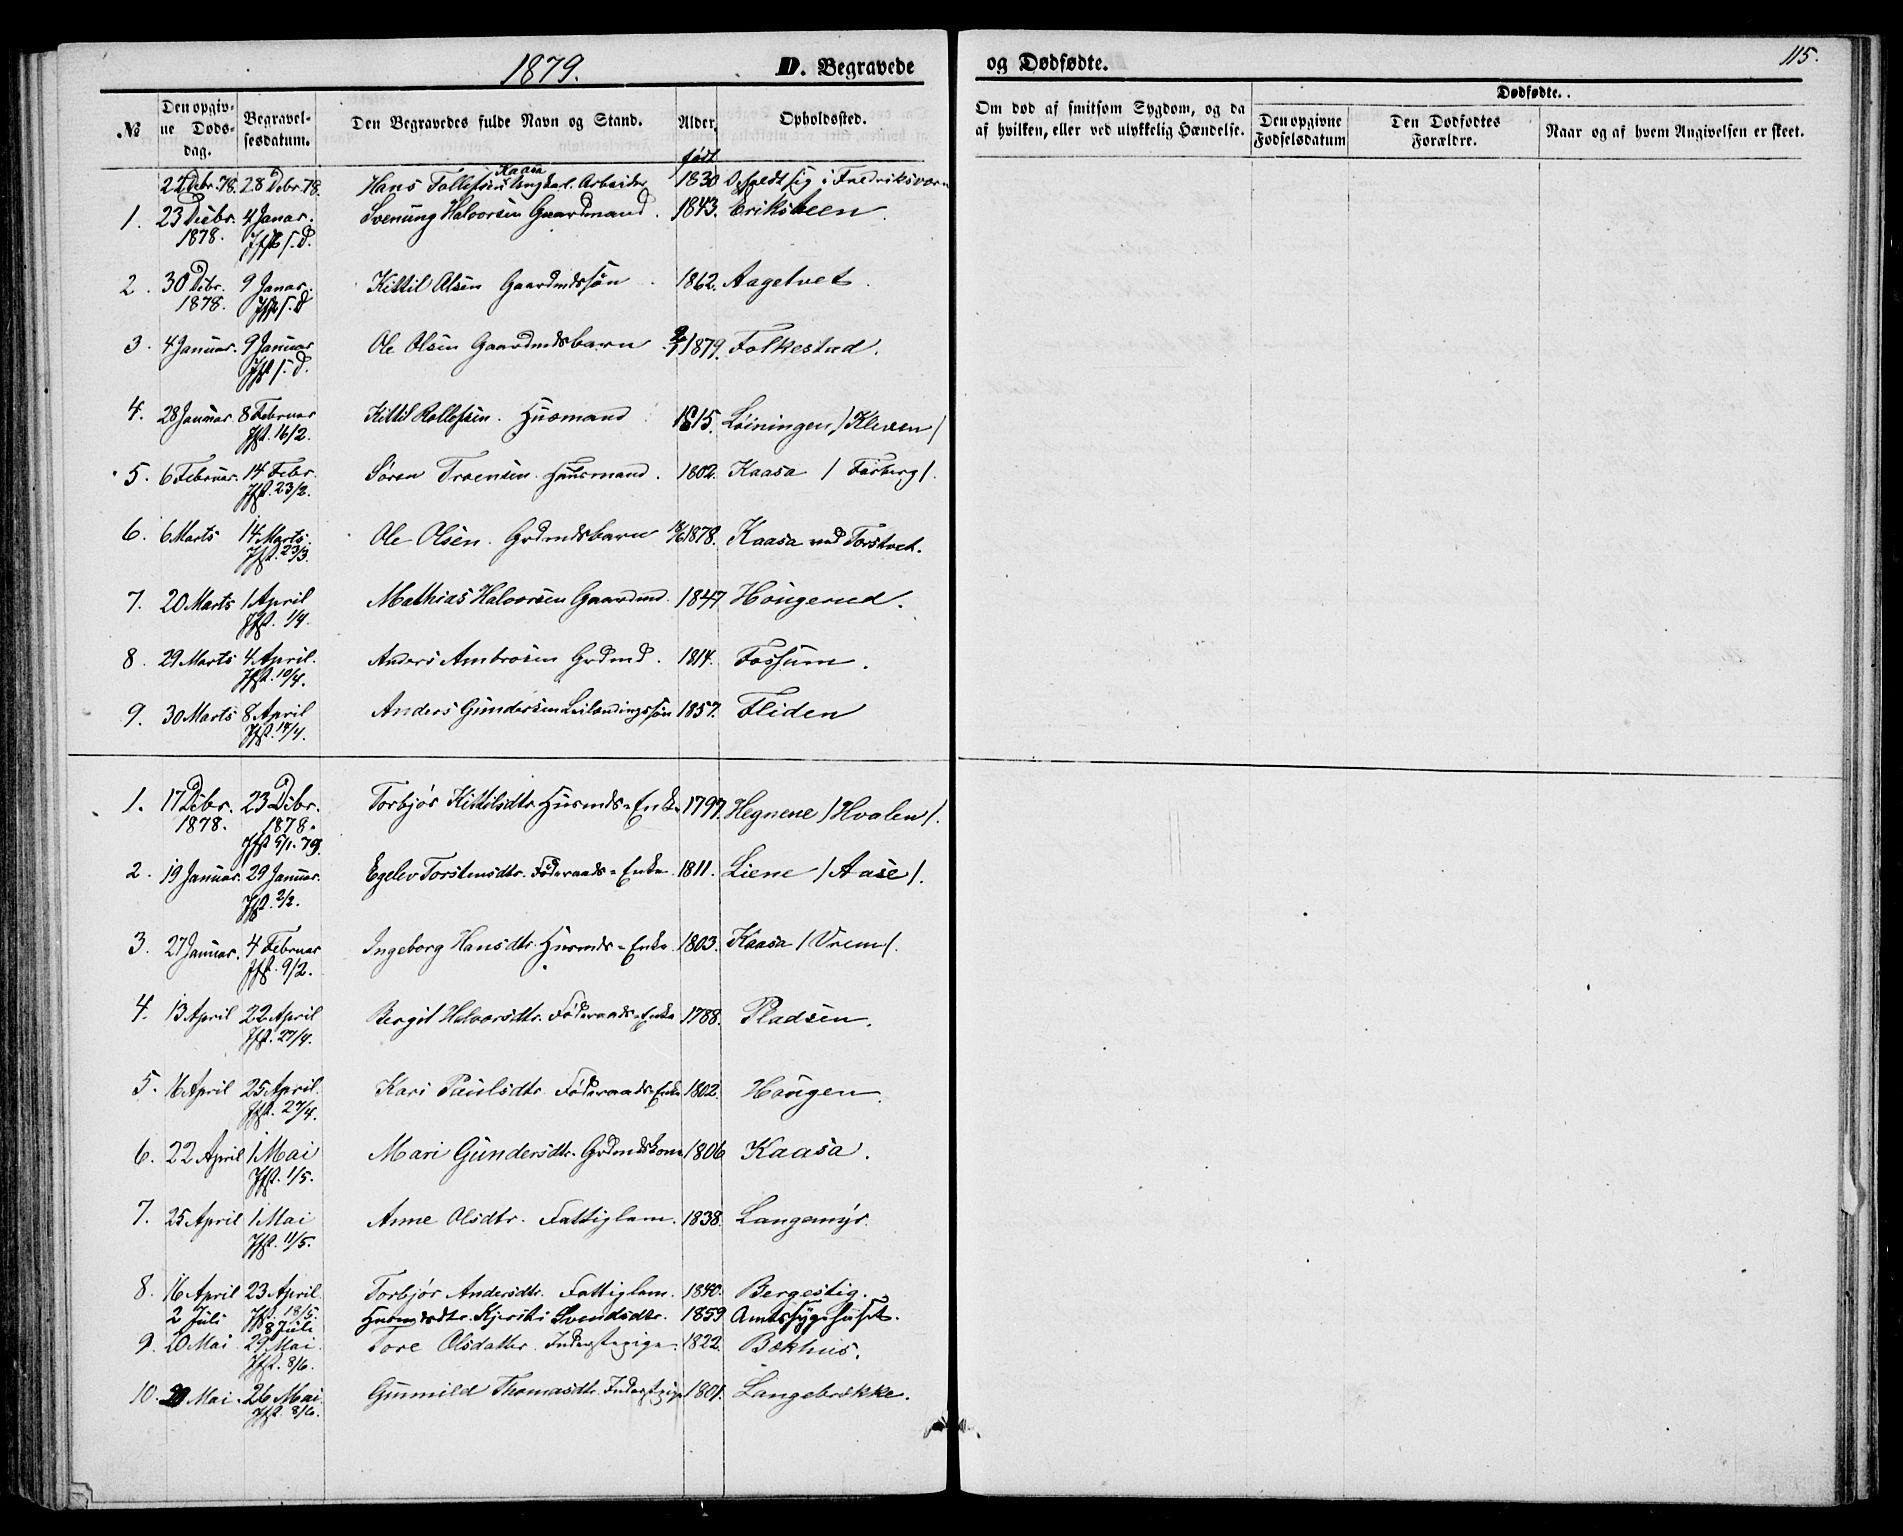 SAKO, Bø kirkebøker, G/Ga/L0004: Klokkerbok nr. 4, 1876-1882, s. 115